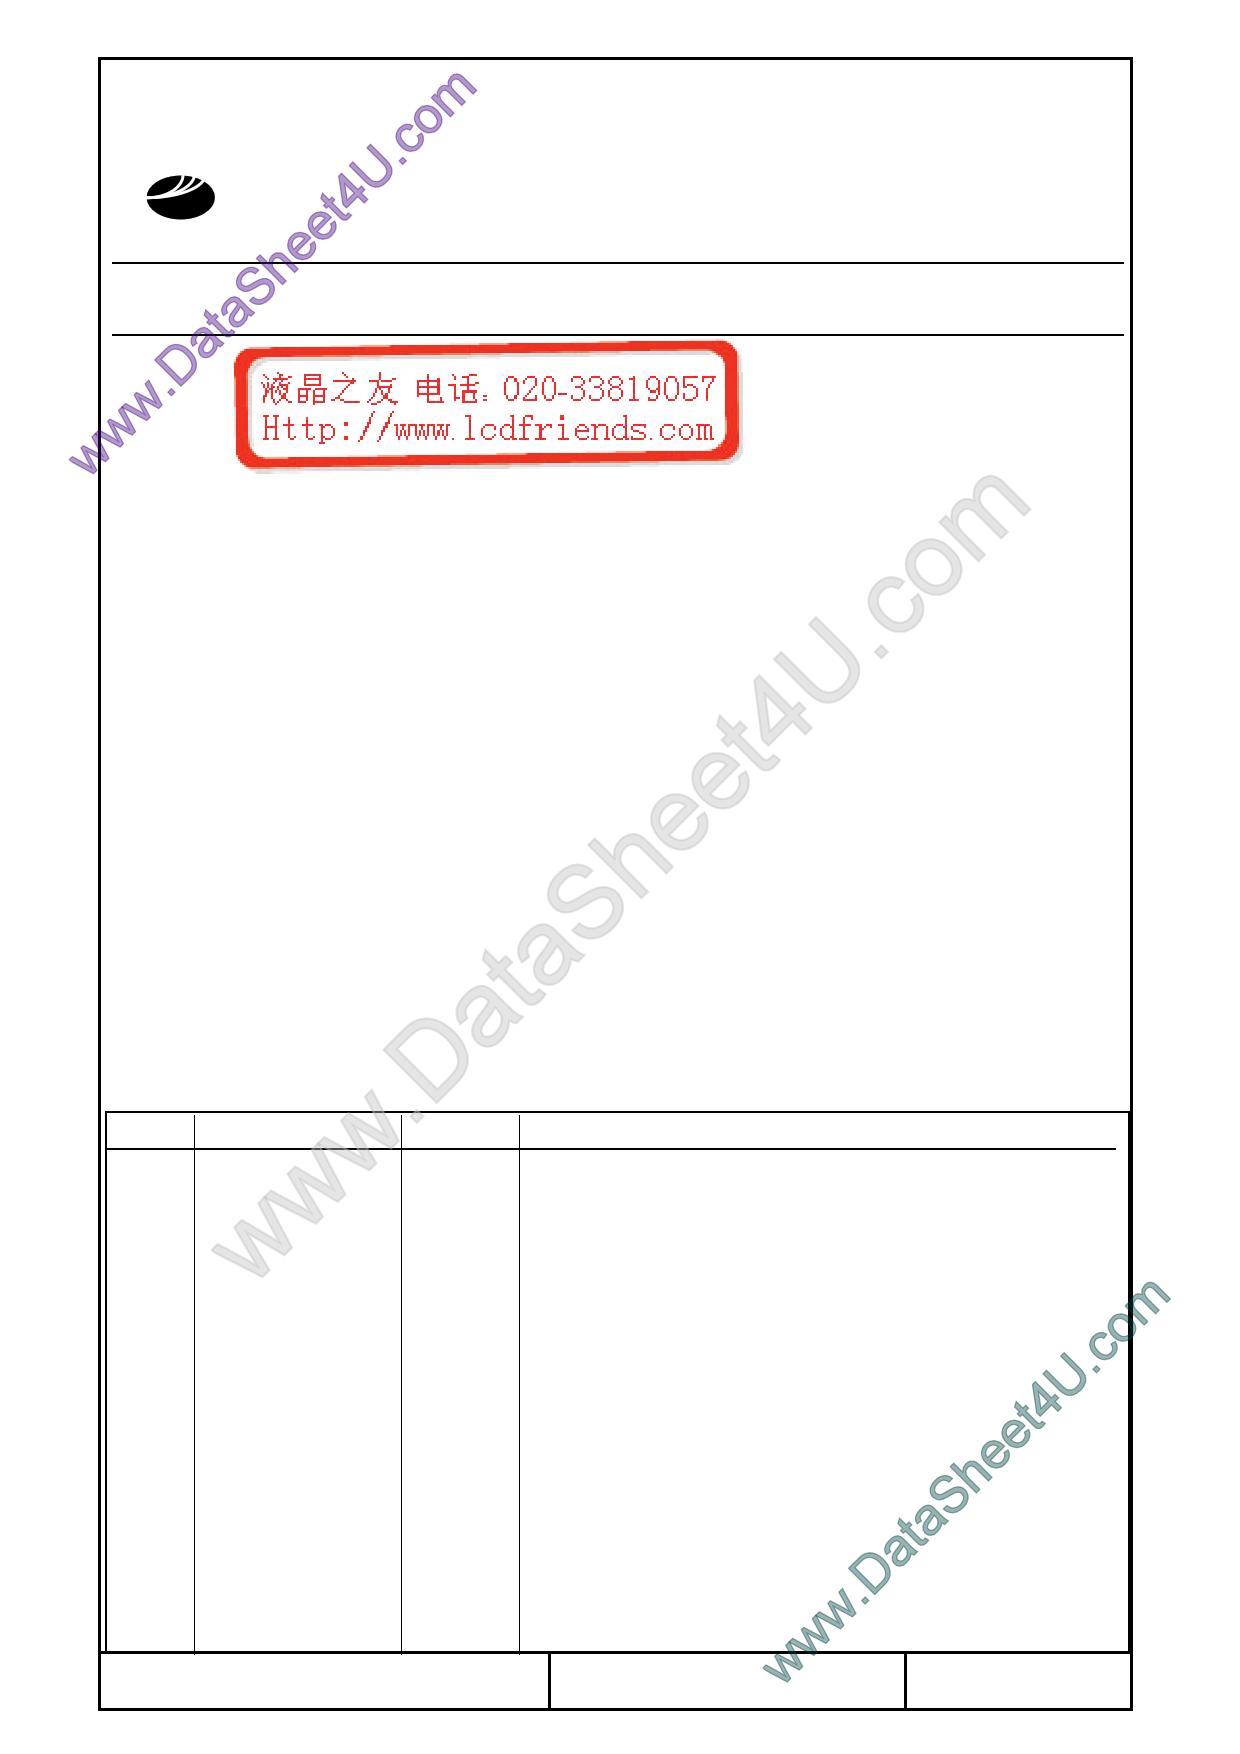 T-51381L064J_FW_P_AD datasheet